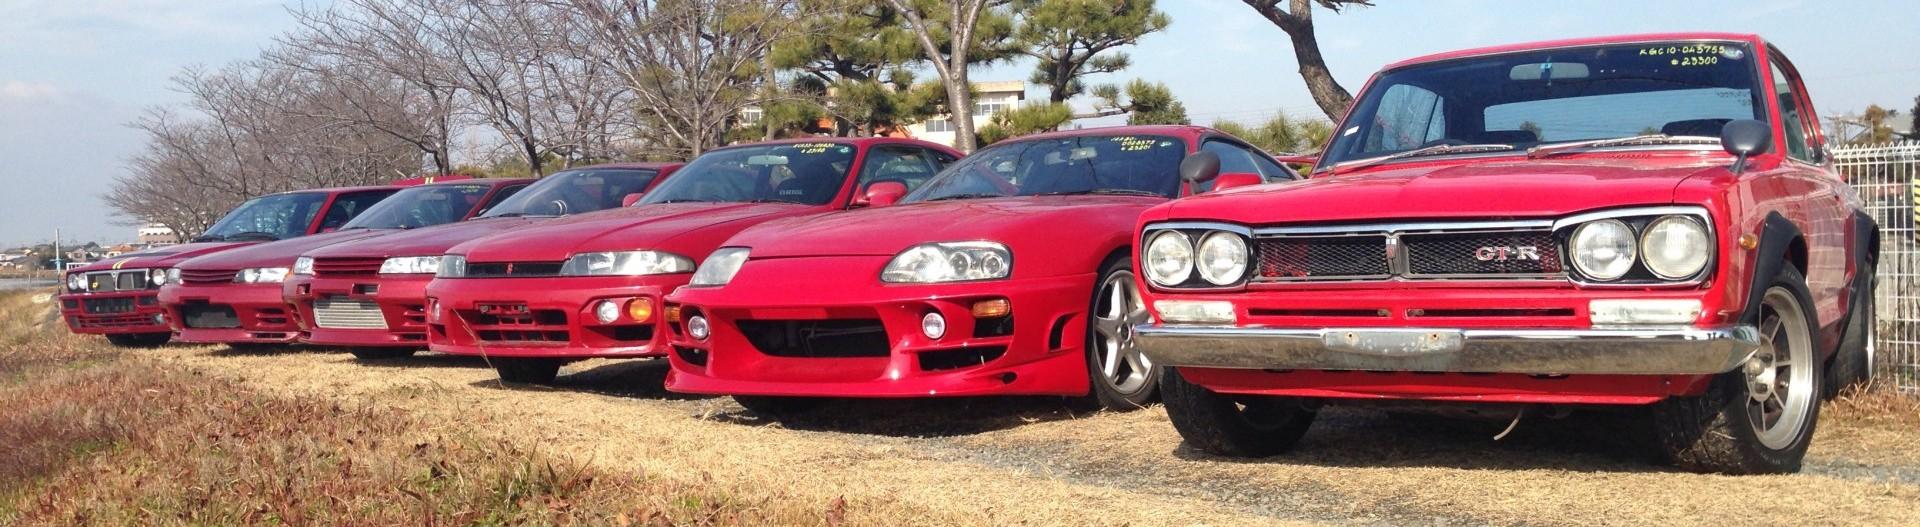 Used Car Auctions Near Me >> Japanese Used Cars Japan Partner